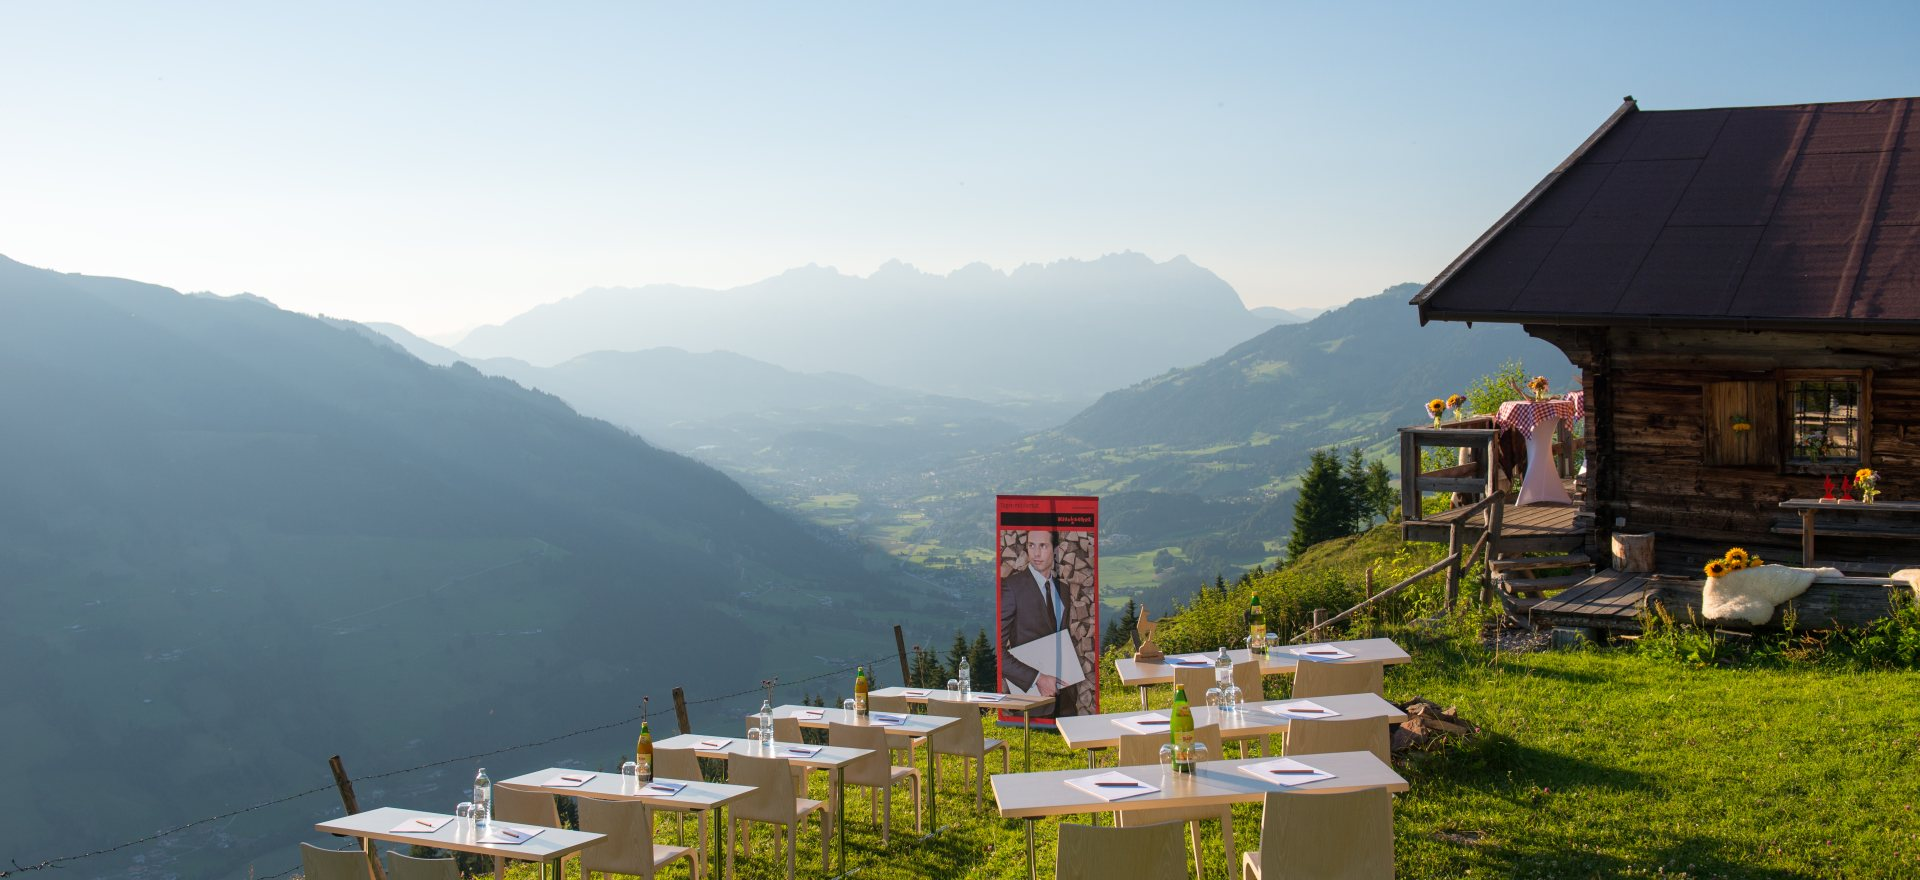 Tagen am Berg - Kitzbühel - © Michael Werlberger